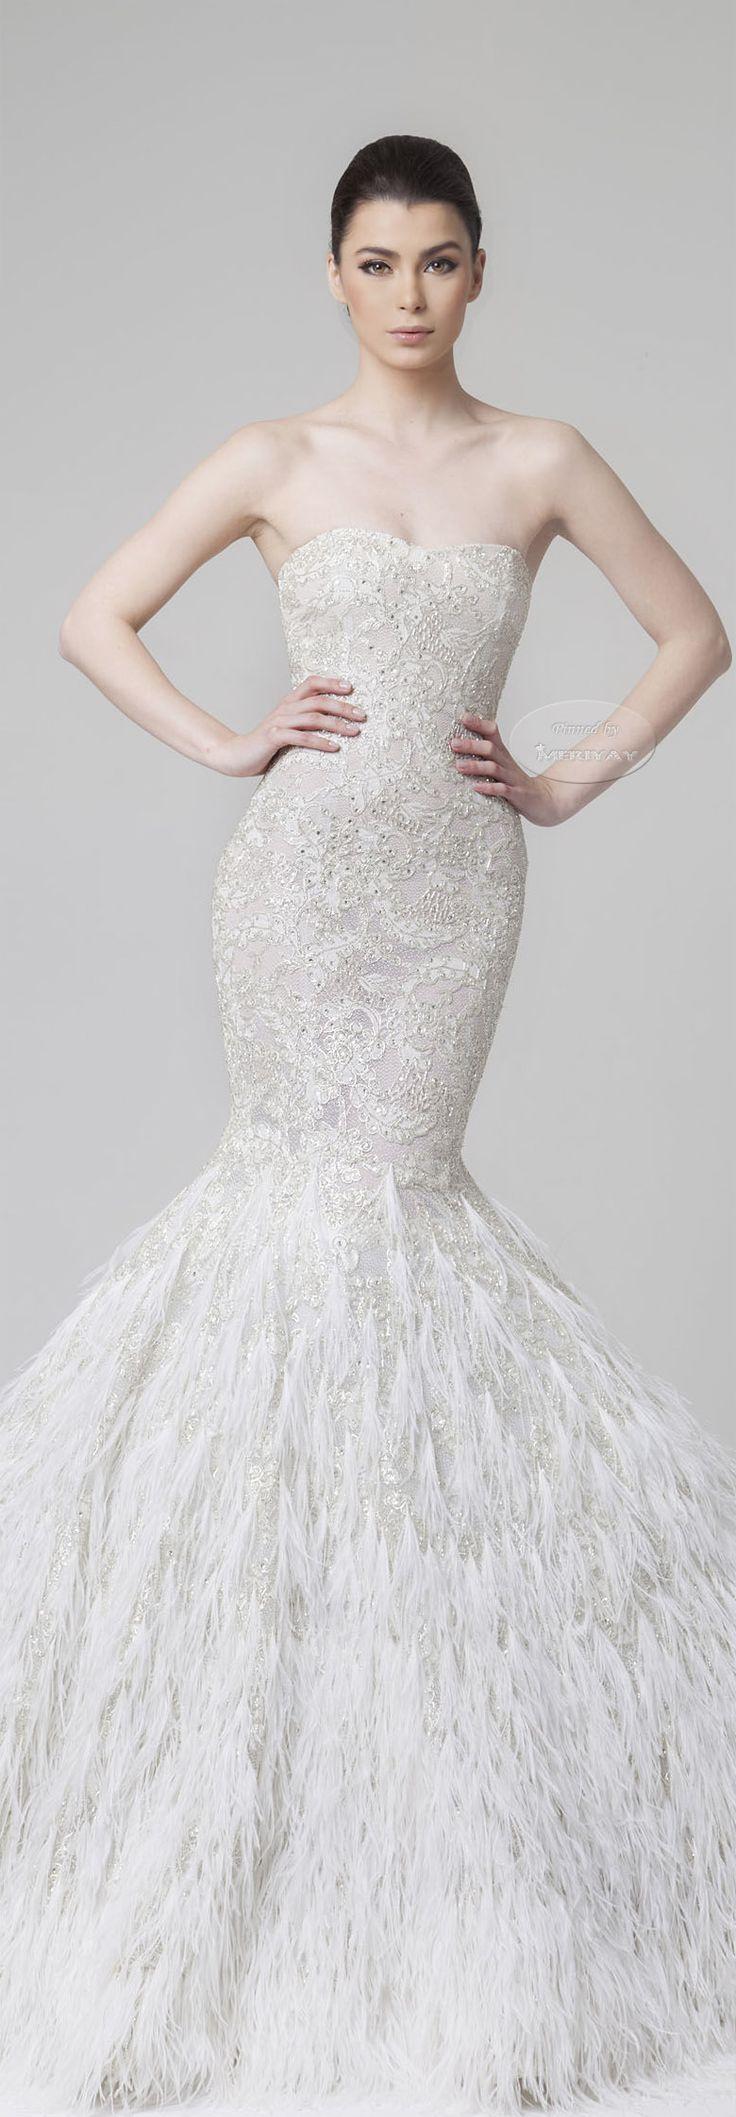 how to make a mermaid dress fuller